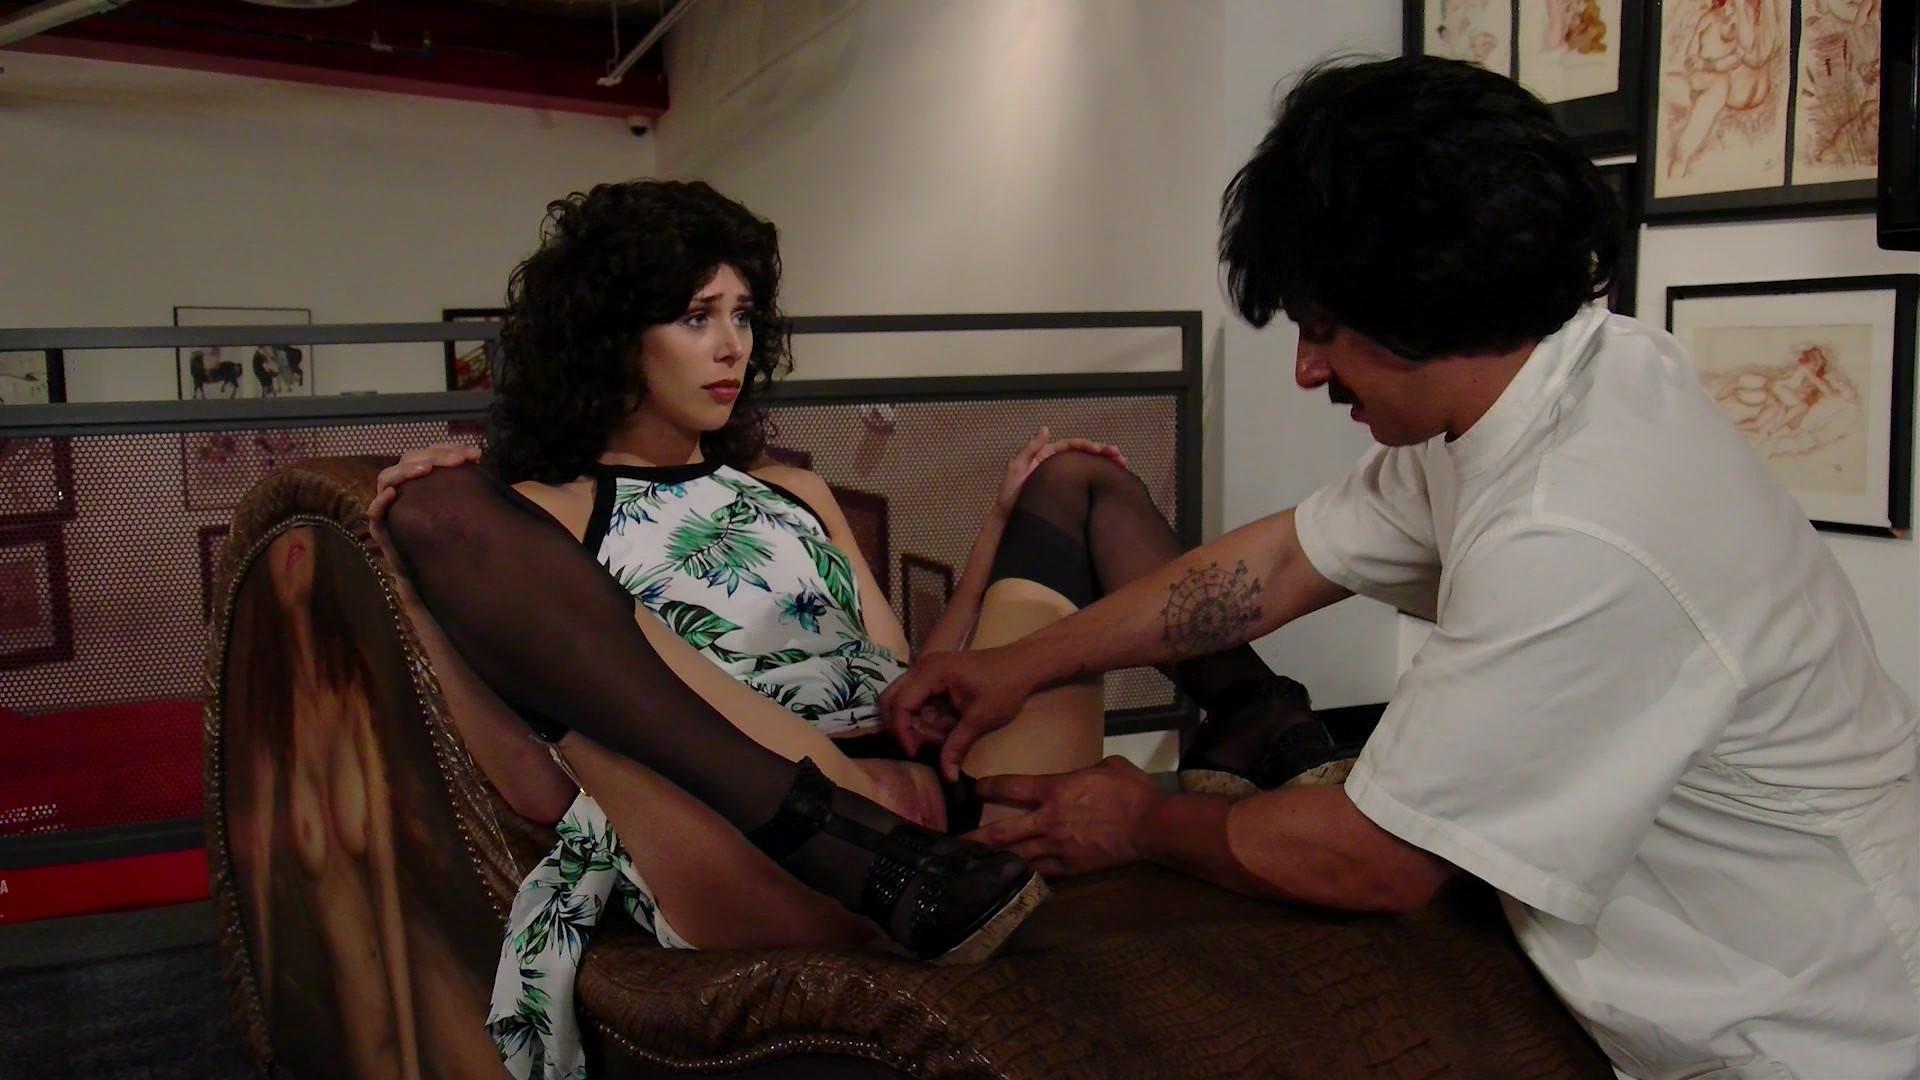 Beautiful Dark Haired Babe Sucks a Big Dildo and a Hot Nurse Fucks a Big Cock Starring: Elizabeth Bentley Anna Morna